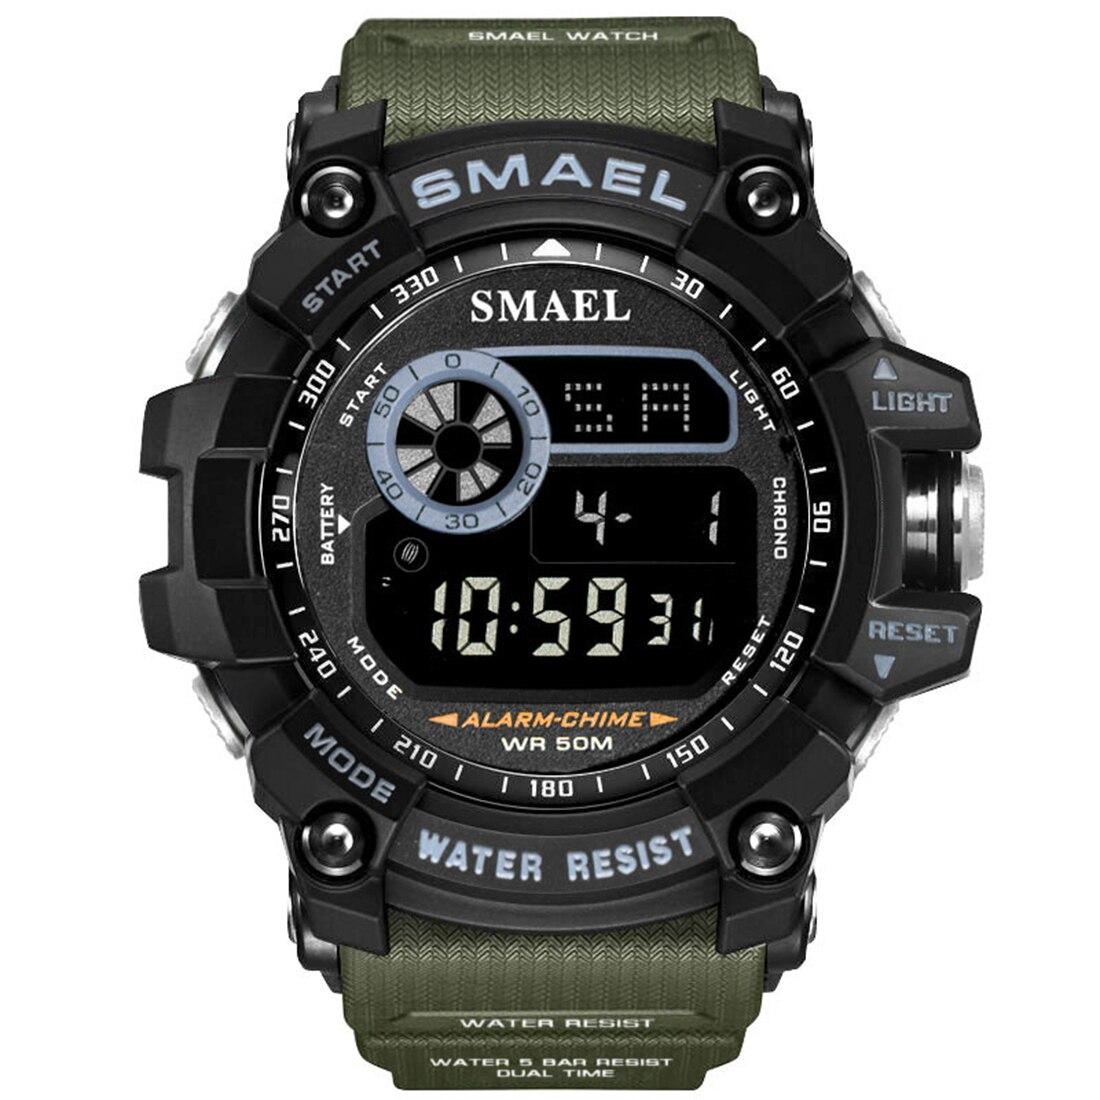 SMAEL Digital Watches Men Big Dial Sport Watch 50M Waterproof LED Clock Digital Watch Light Men Digital Watch Relogio Masculino